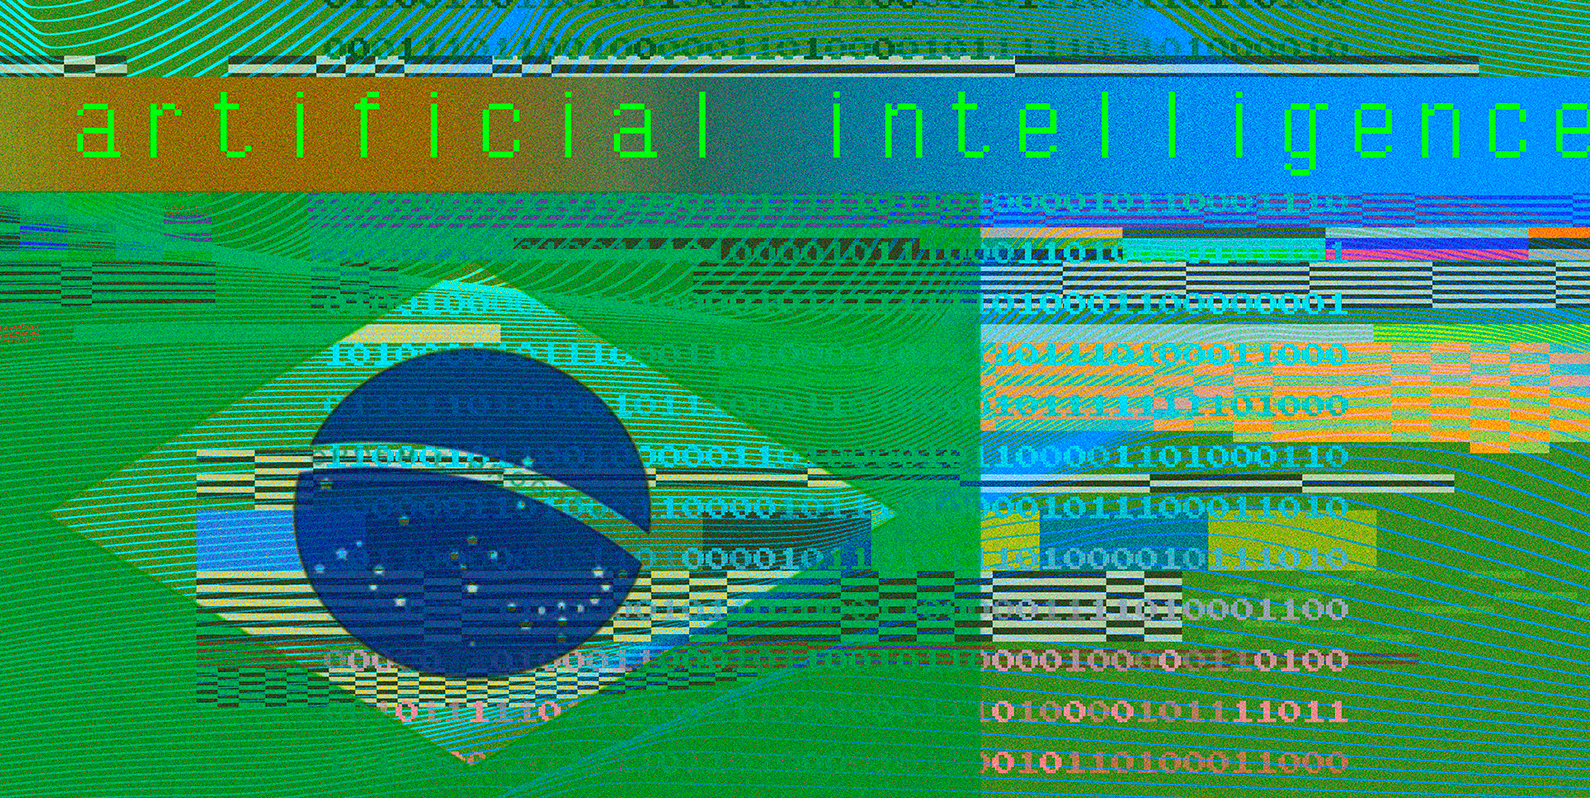 A Estratégia Brasileira de Inteligência Artificial